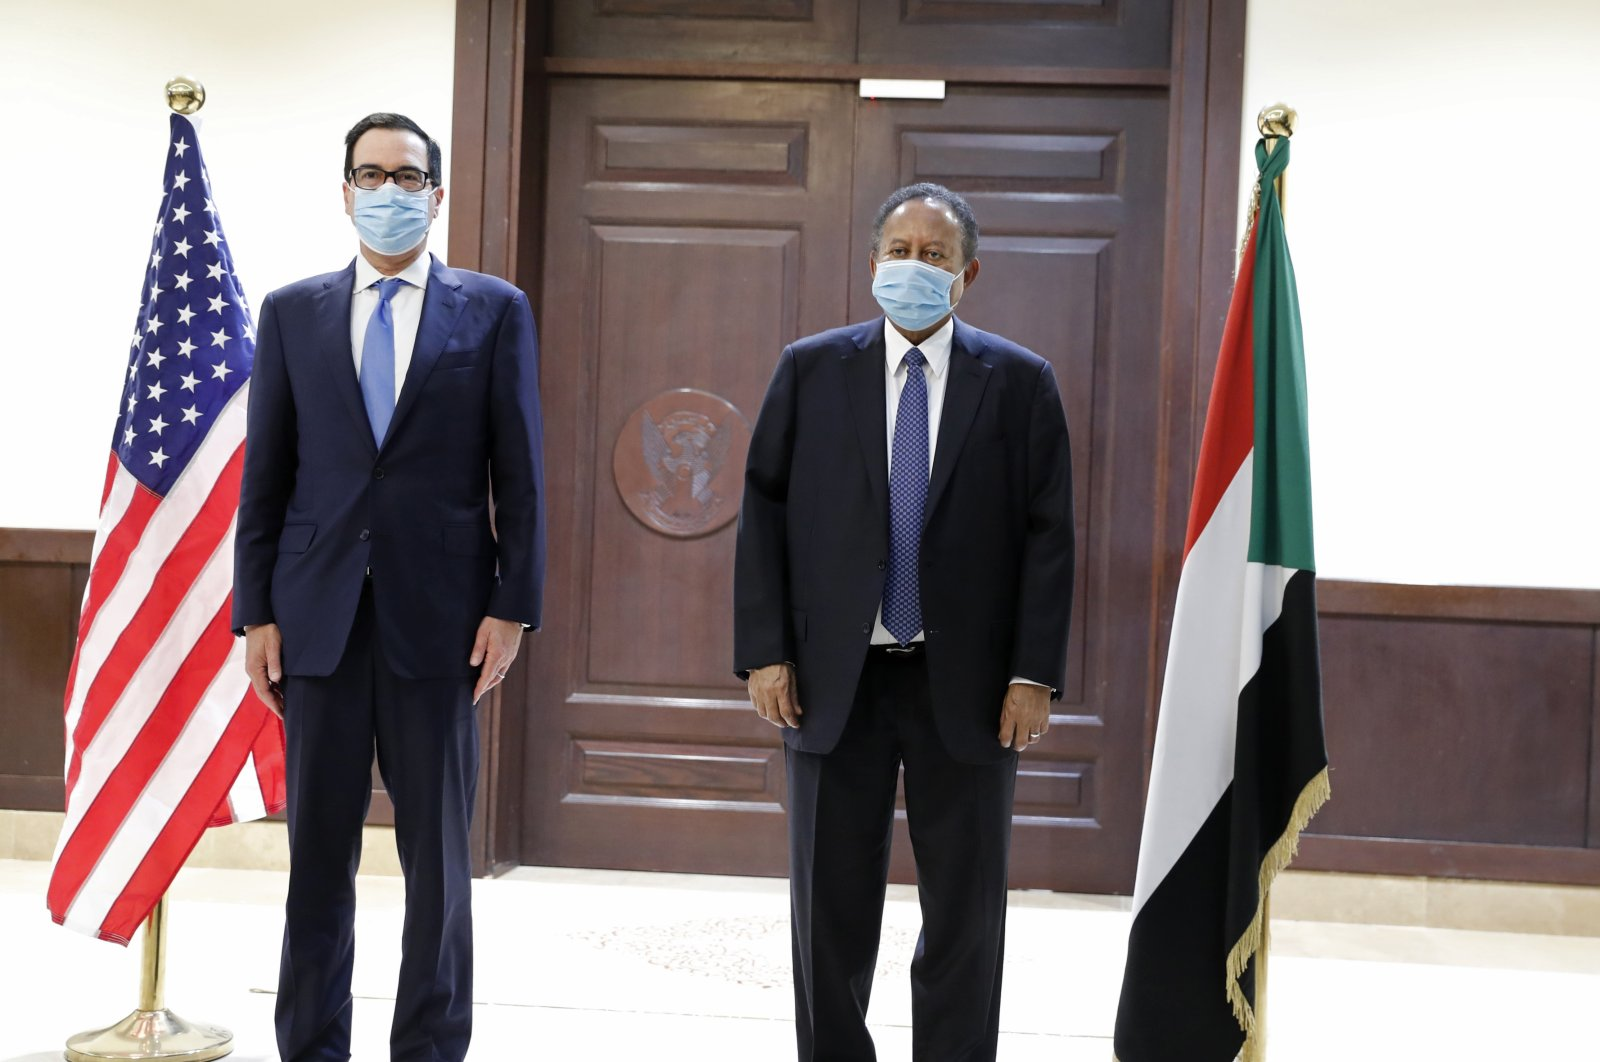 Sudanese Prime Minister Abdullah Hamdok (R) welcomes U.S. Treasury Secretary Steven Mnuchin to the Cabinet Building, in Khartoum, Sudan, Jan. 6, 2021. (AP Photo)